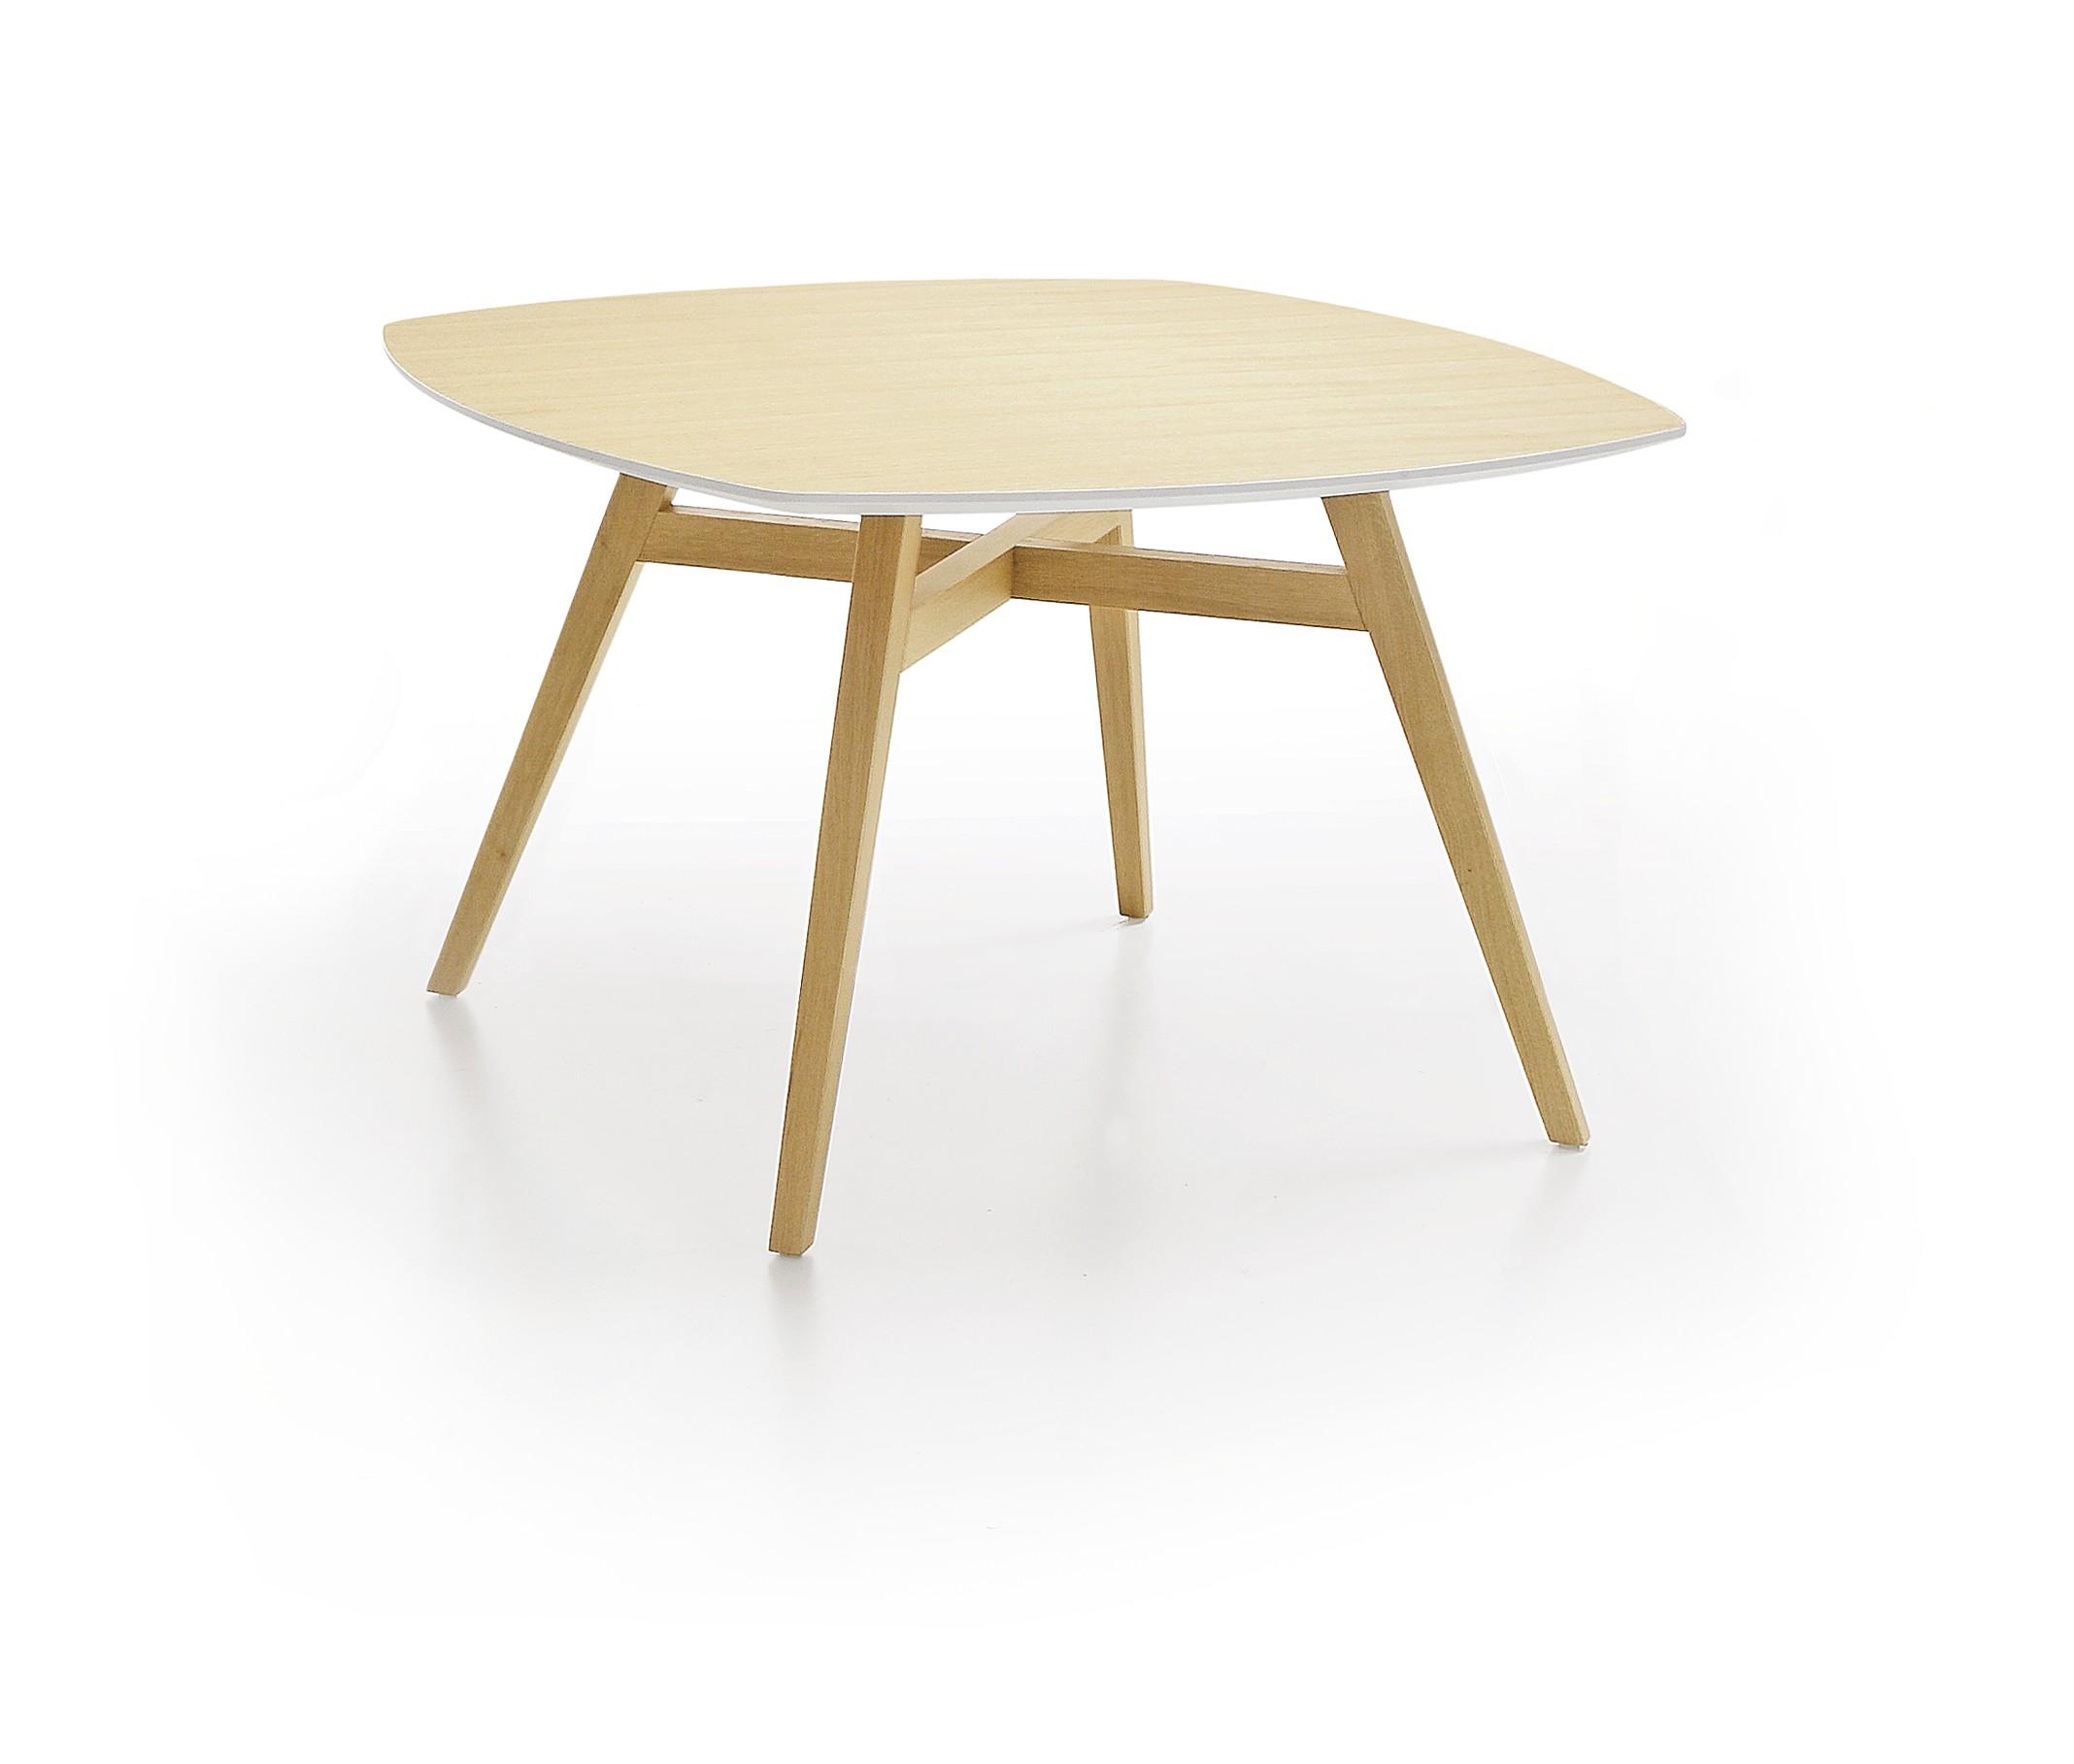 Emma table_18 (1).jpg